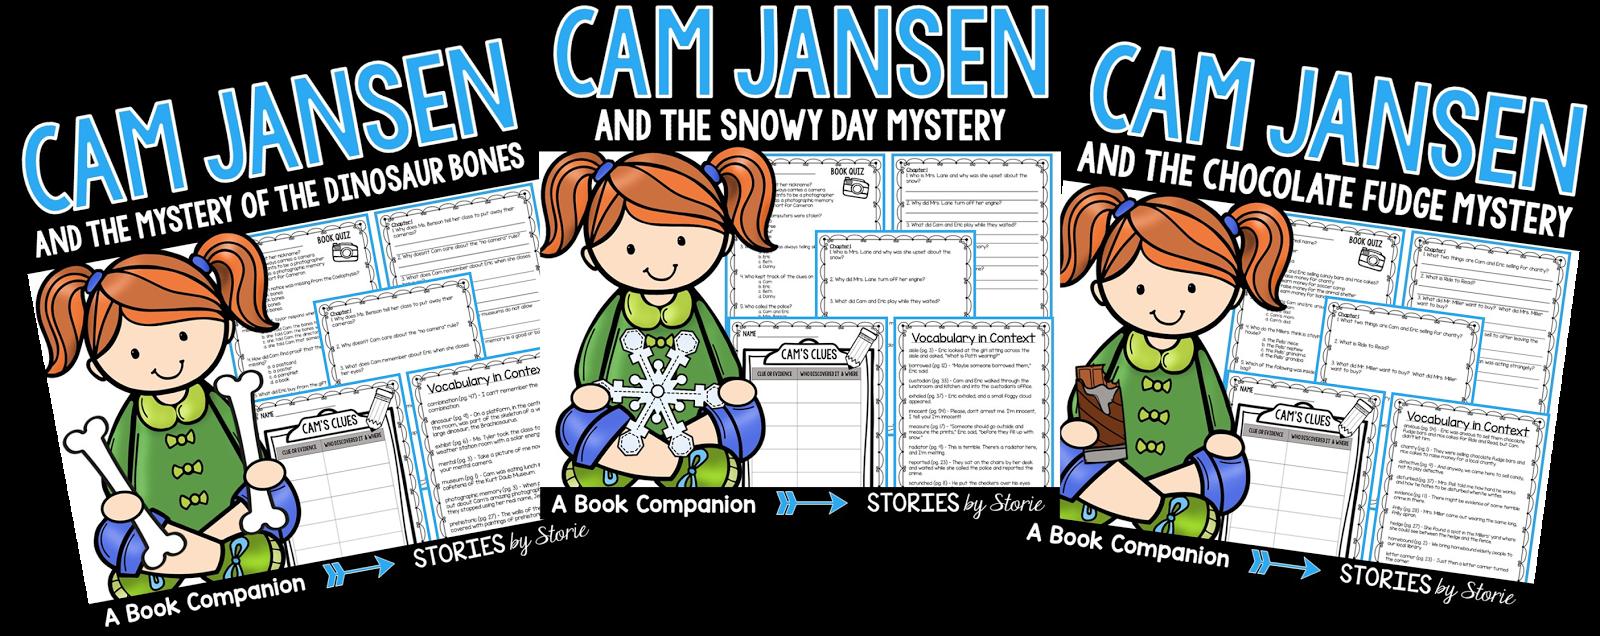 cam jansen coloring pages - photo#38